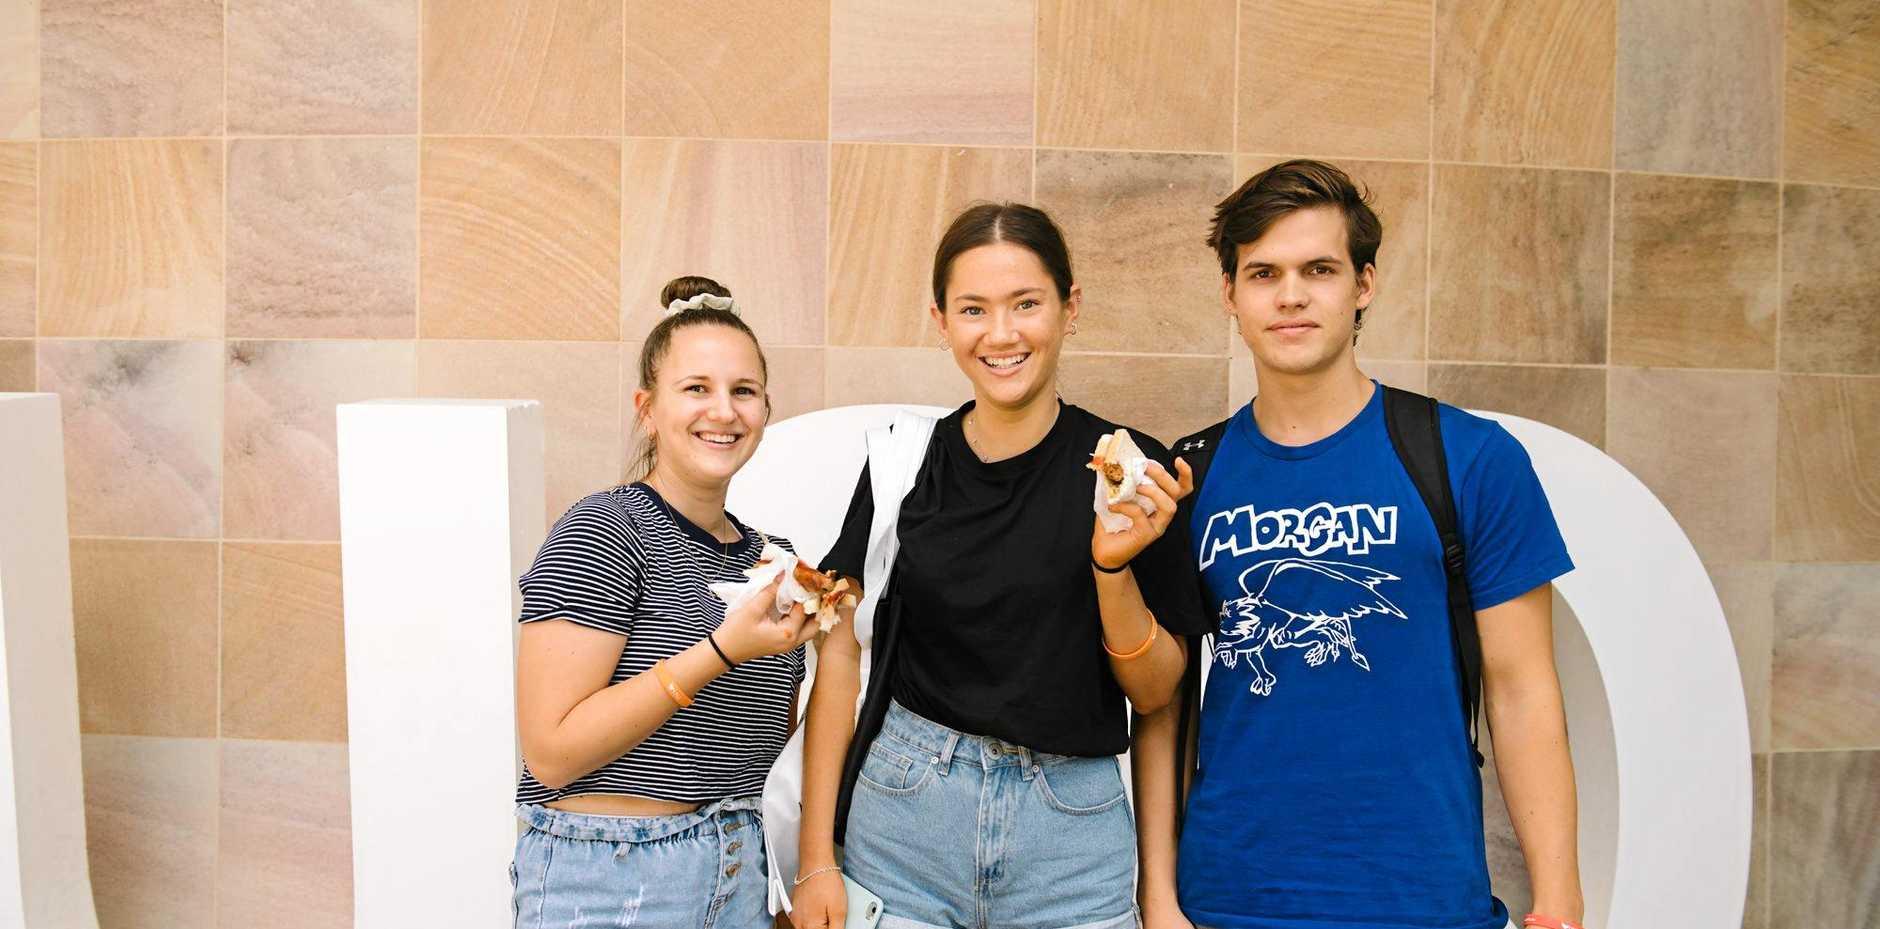 Natalie Brandish, Aleisha Mizzi and Ryan Kerr at USQ Ipswich for Orientation.